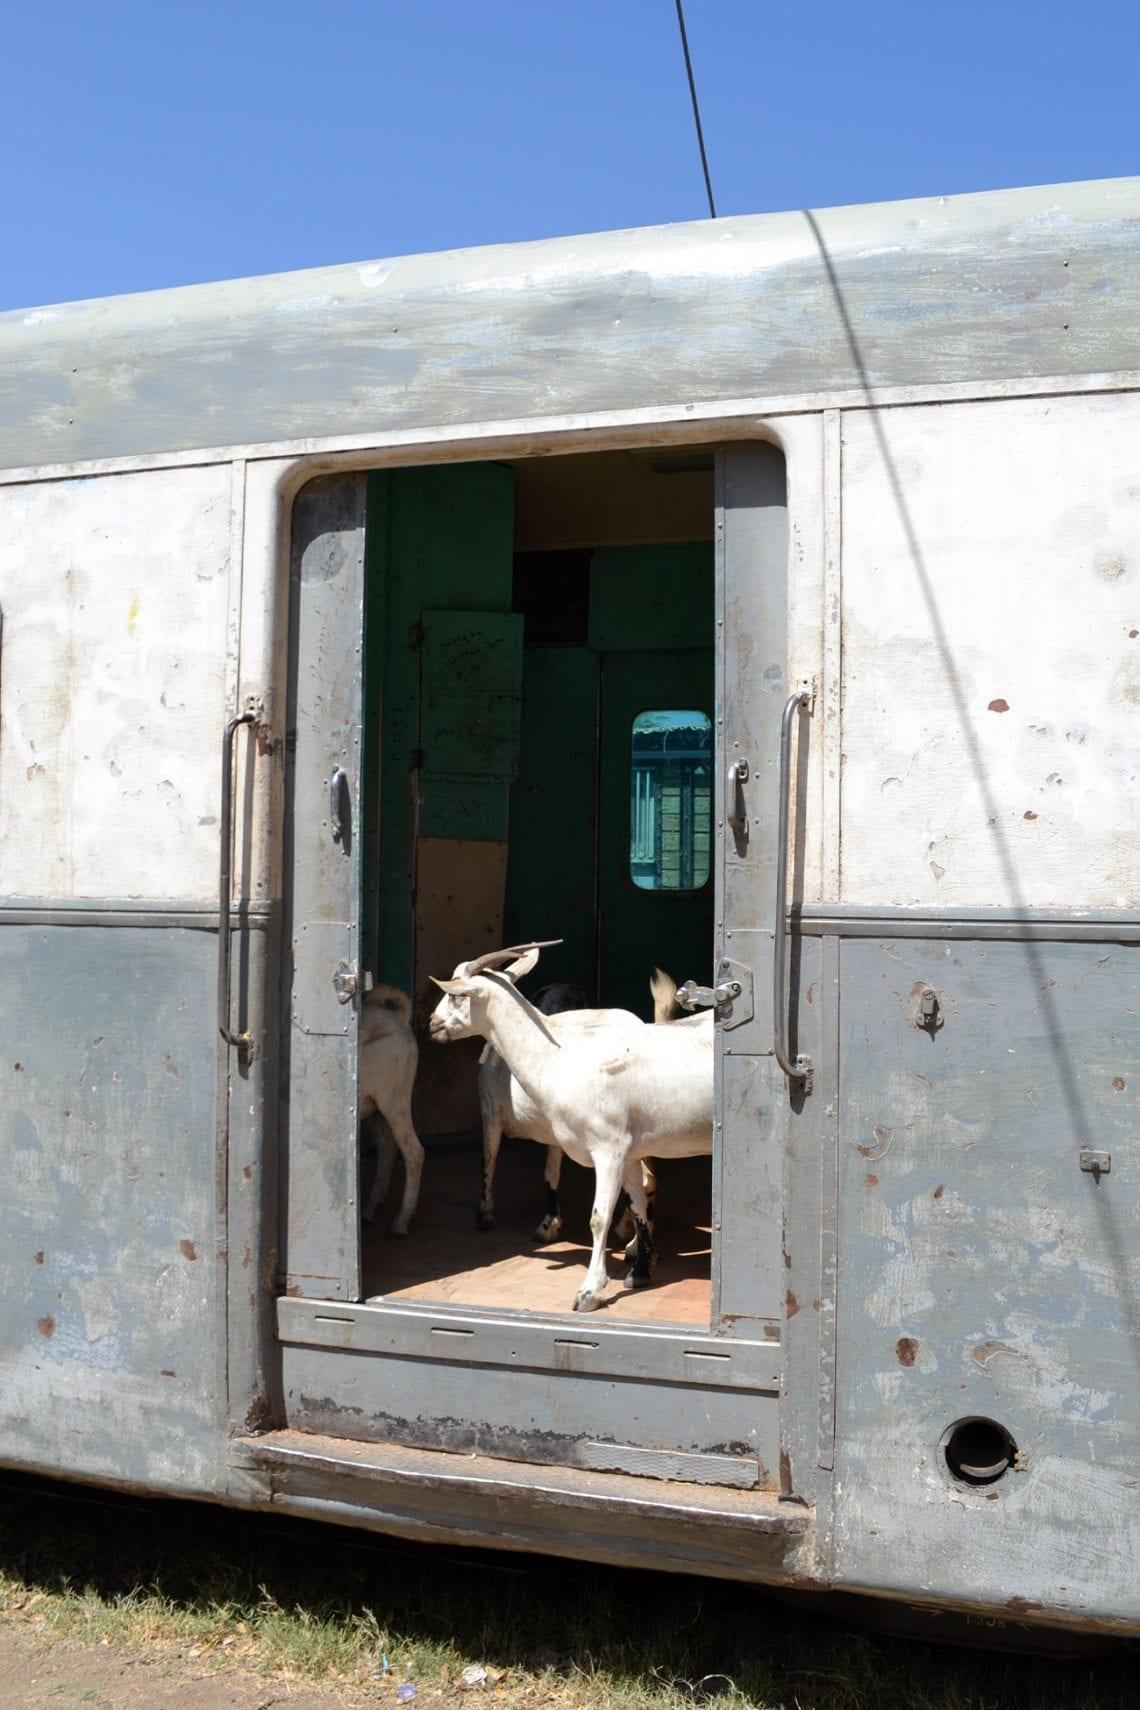 somaliland goats on train